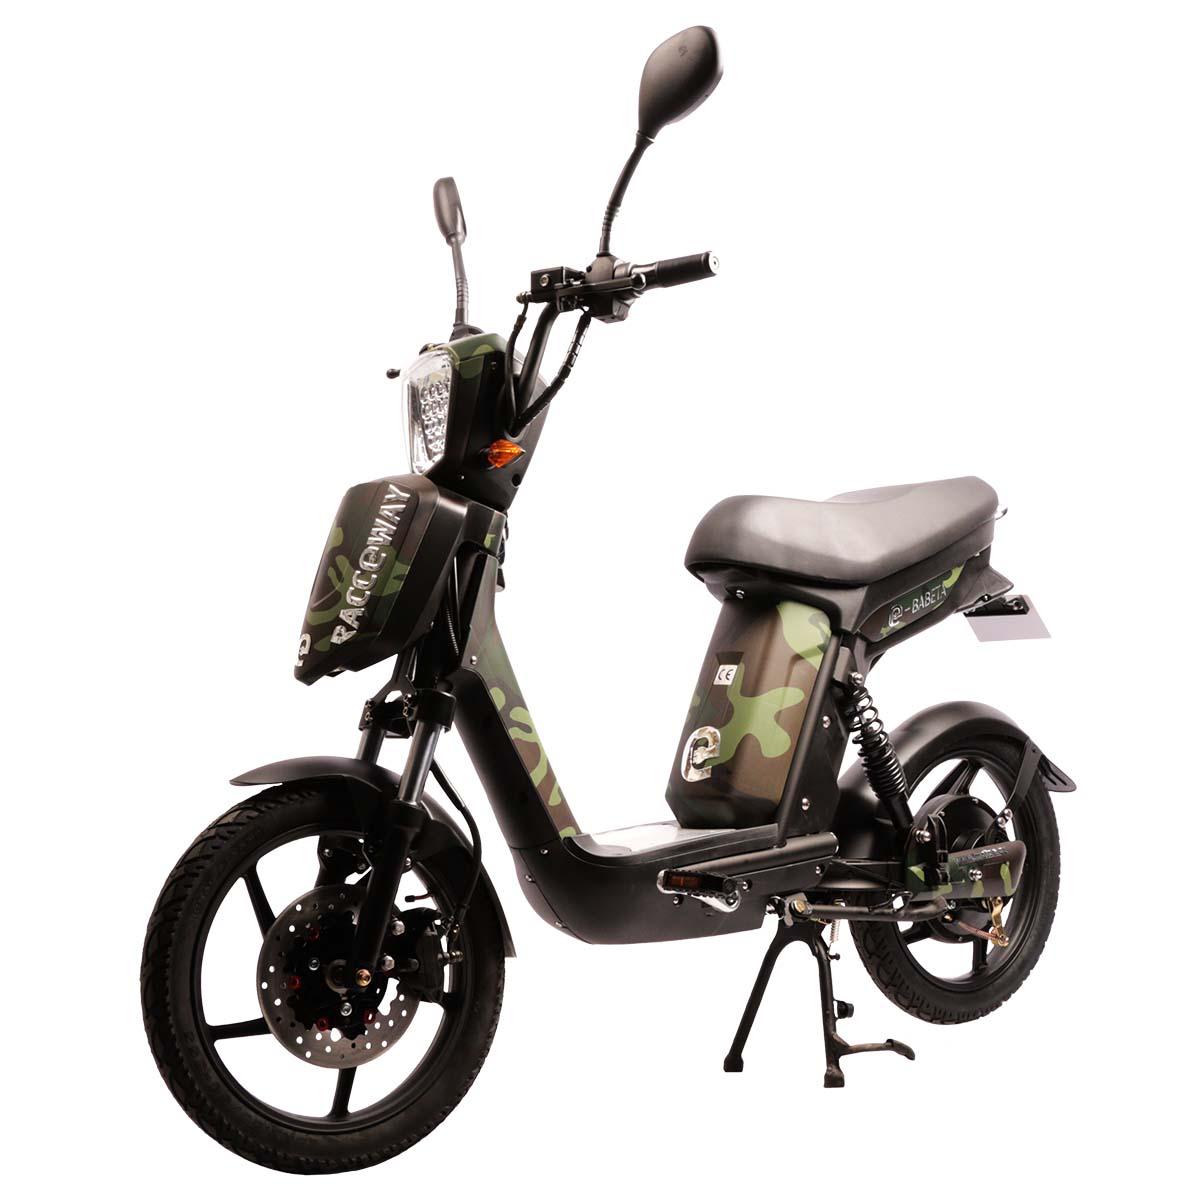 Elektrický motocykl RACCEWAY E-BABETA Barva: maskáč zelený